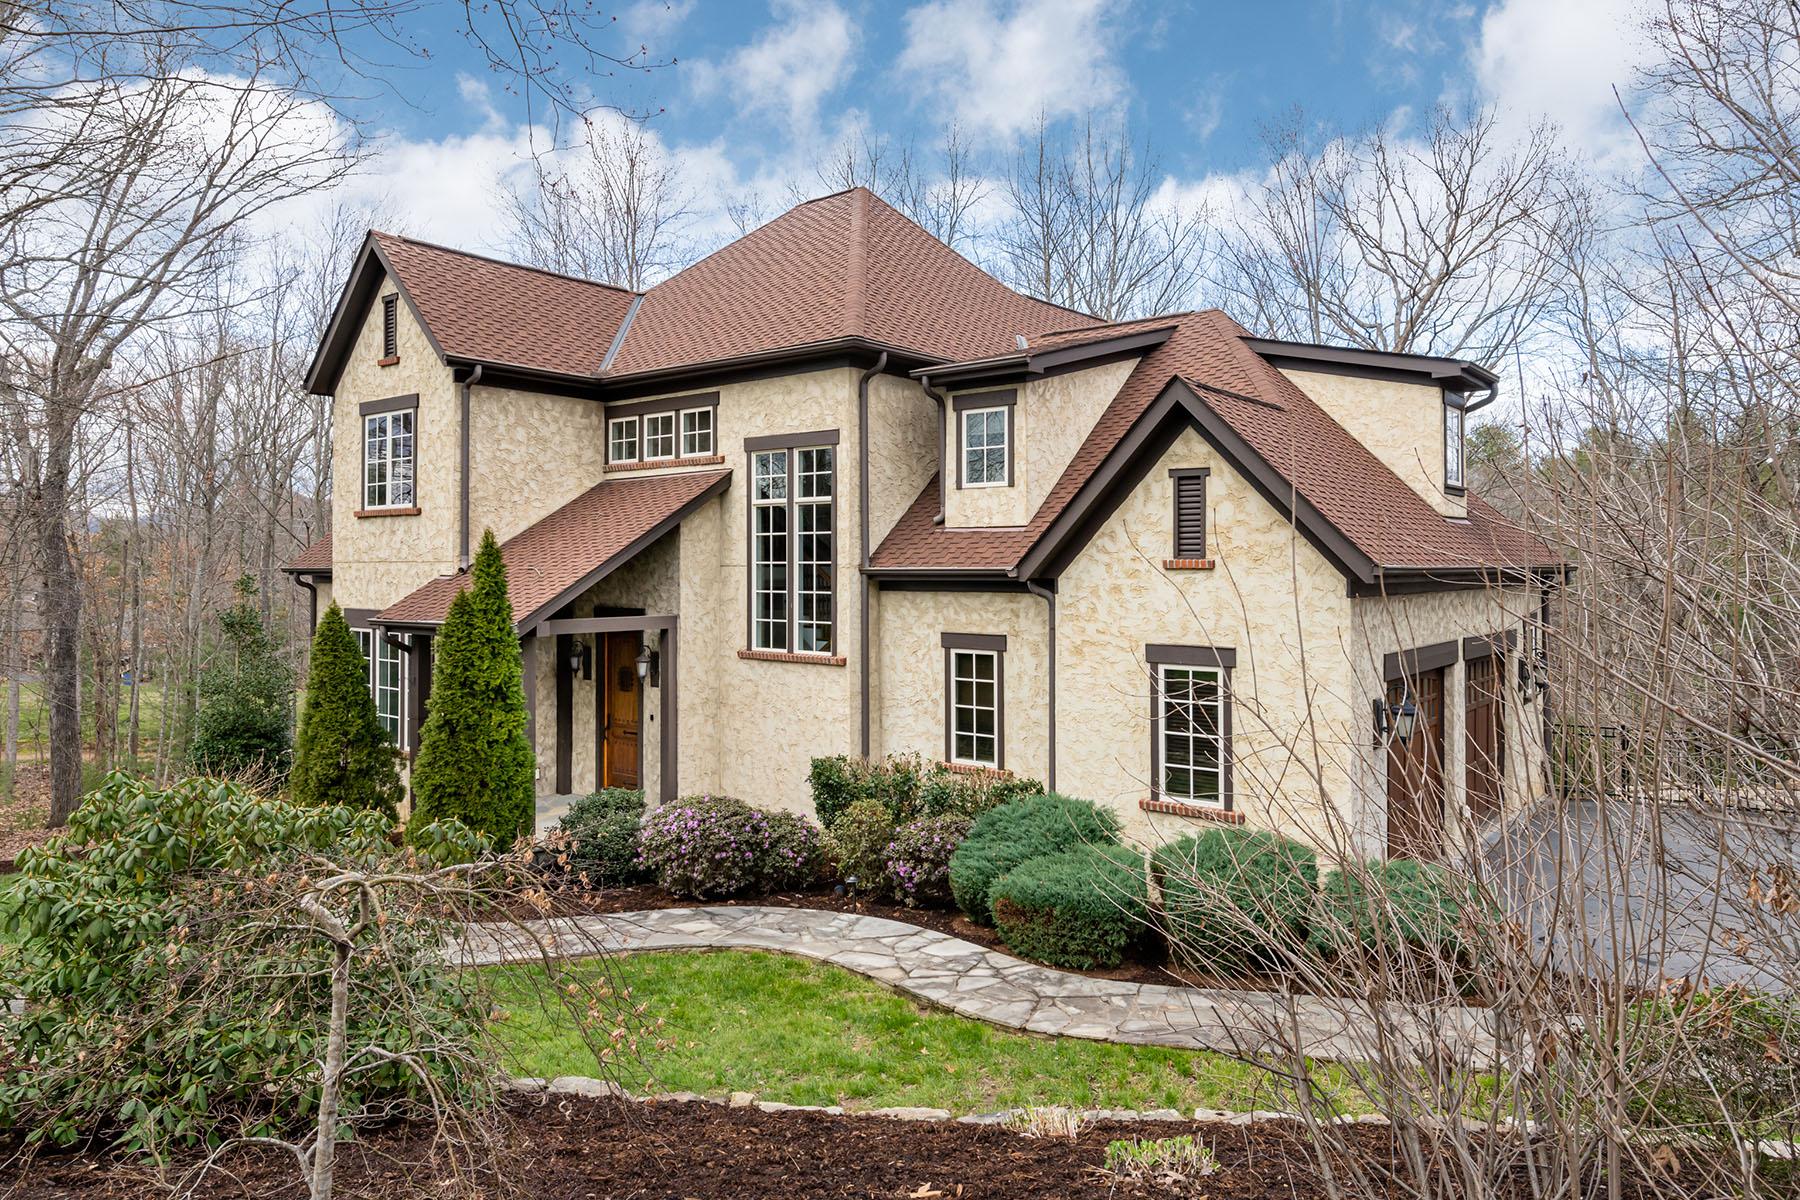 Single Family Homes for Sale at 659 Wickhams Fancy Dr Biltmore Lake, North Carolina 28715 United States